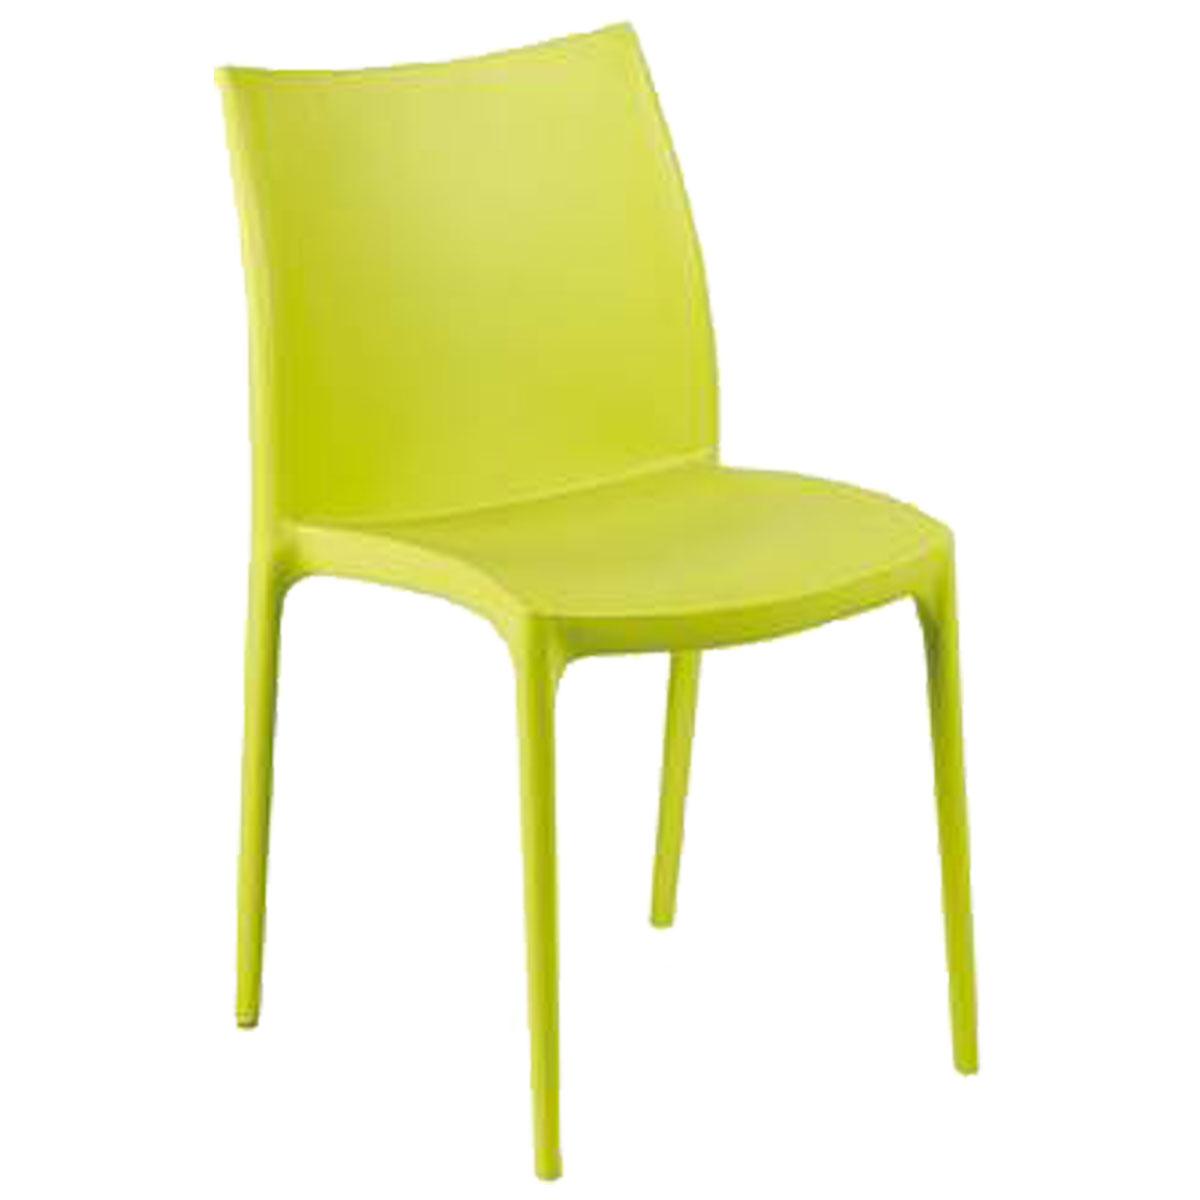 kromy c lime 01 - https://www.werzalit.com/es/producto/kromy-stuhl/